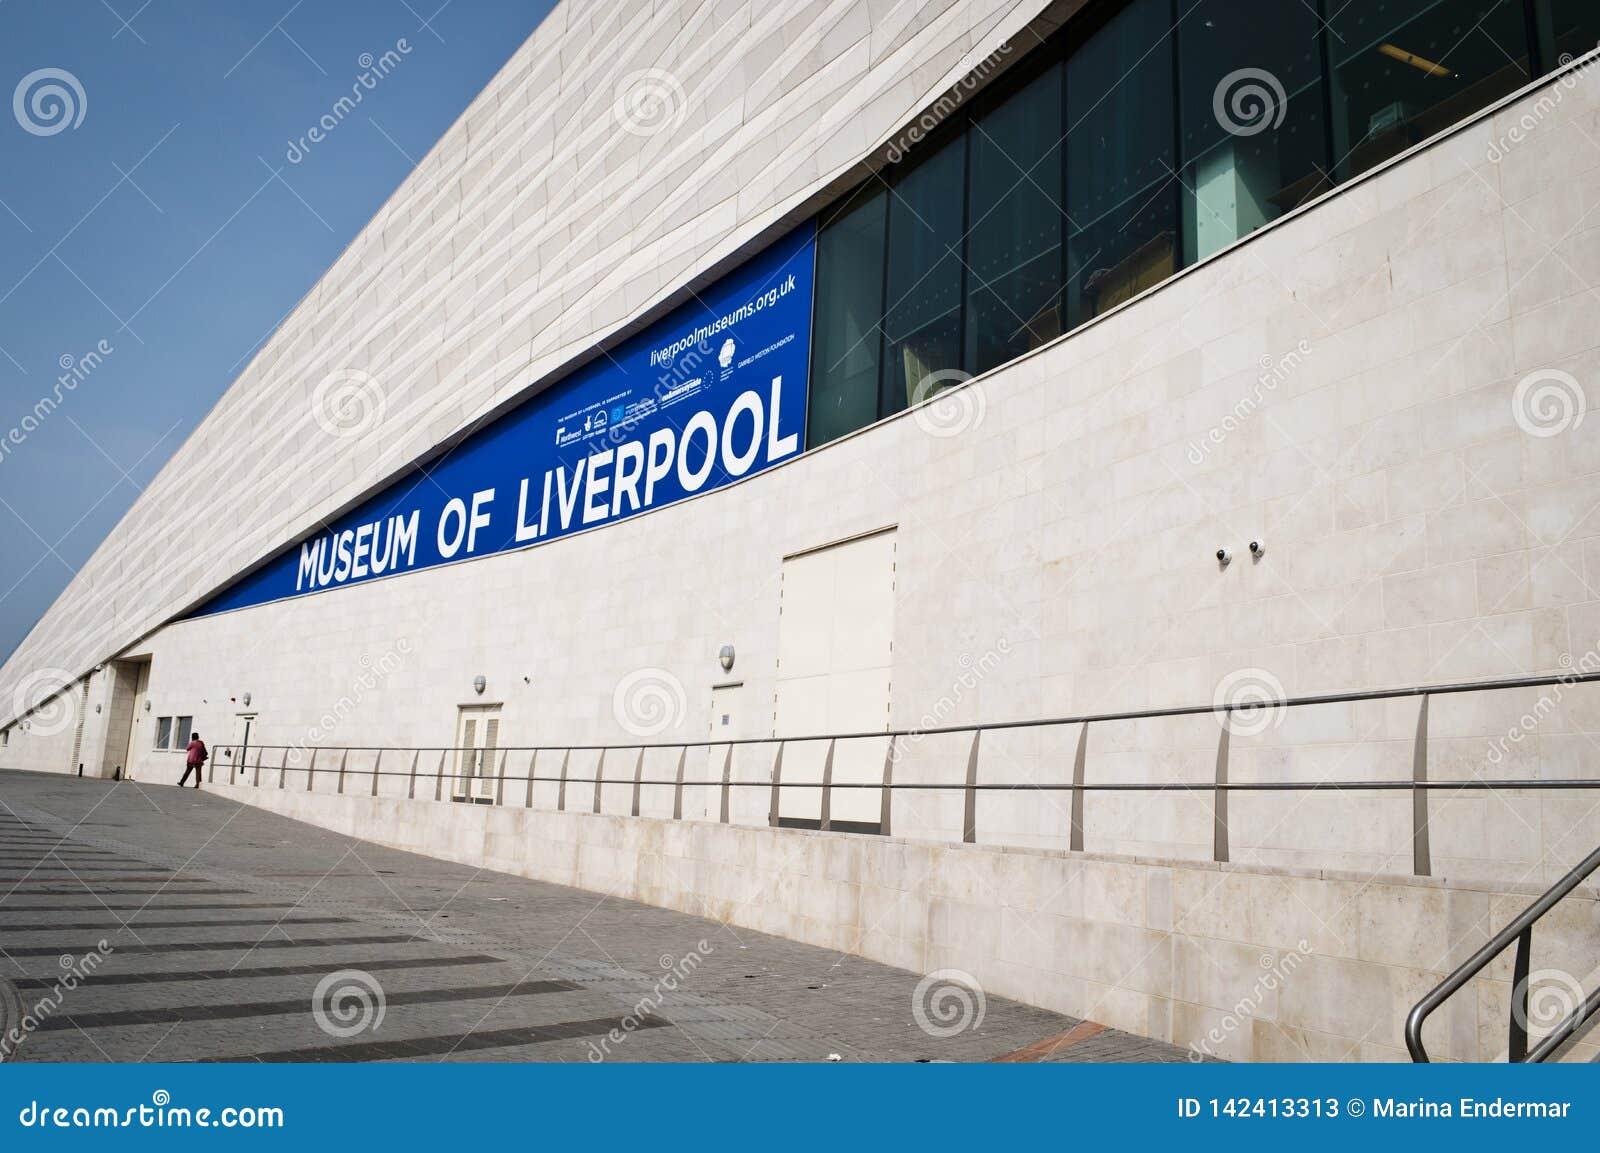 Museum of Liverpool, Pier Head, Liverpool Waterfront, UK